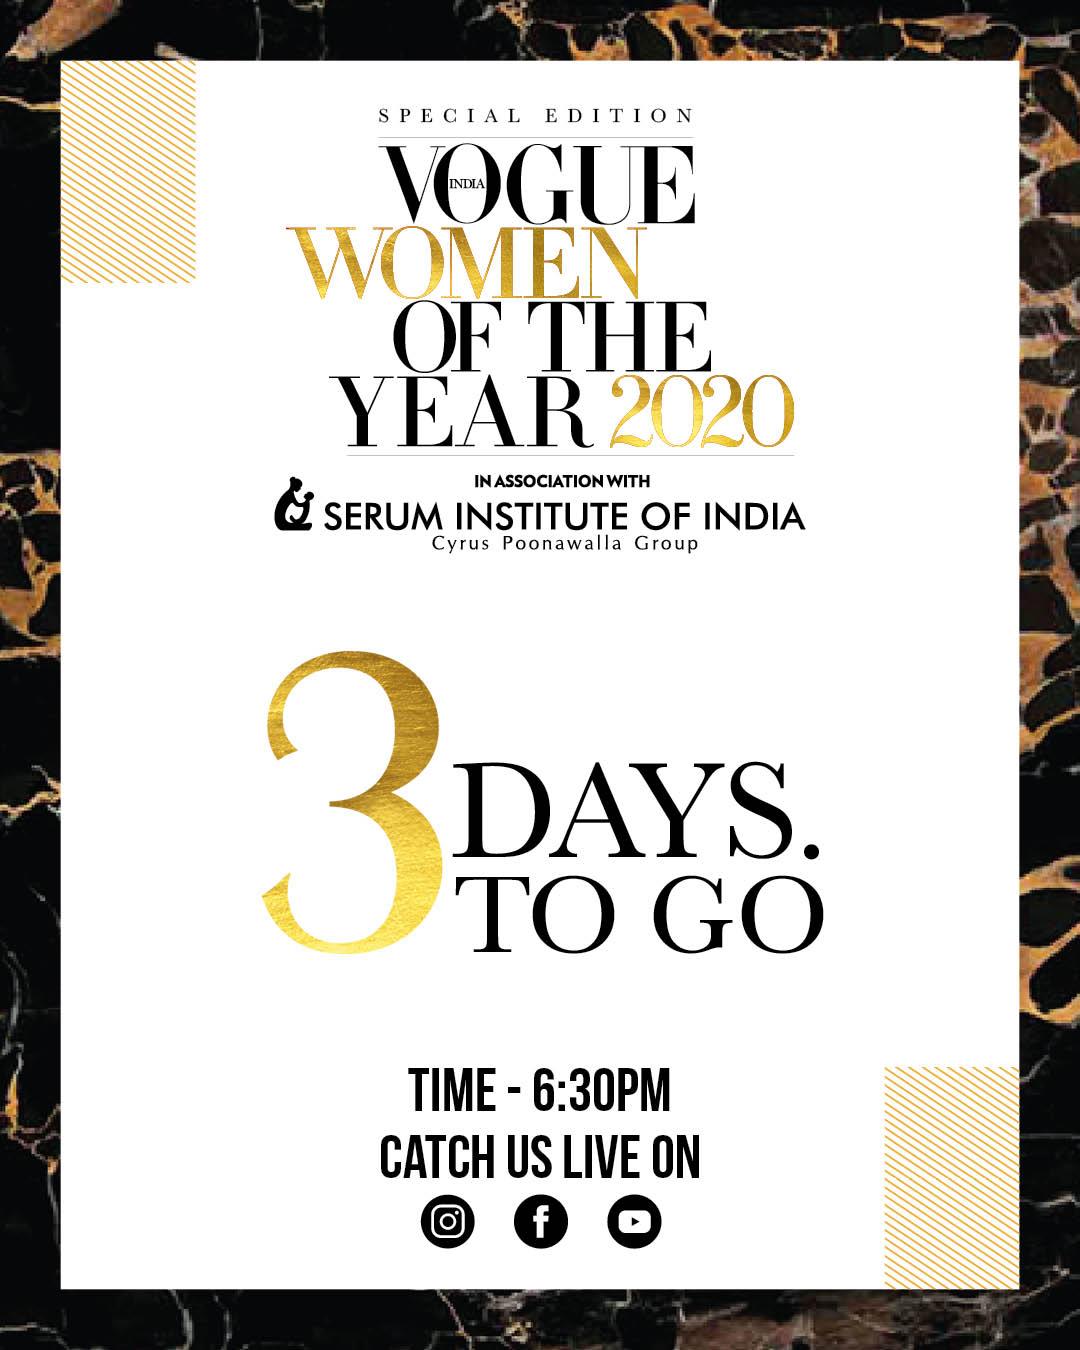 IG POST countdown - Madhura Phadnis - India - Vogue WOTY - Sponsor 2